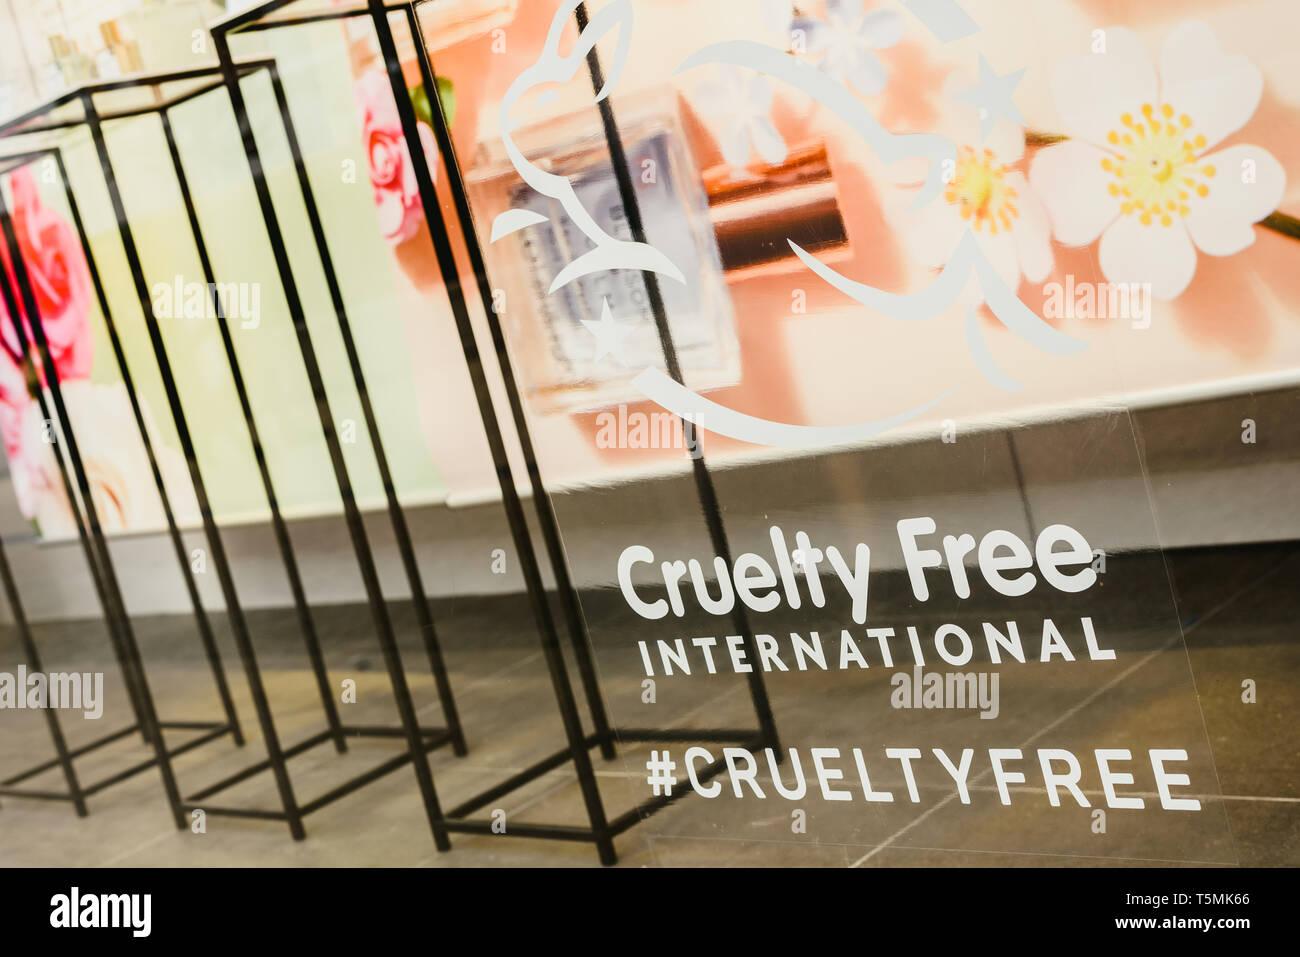 Valencia, Spain - February 2, 2019: Cruelty Free logo on the escaparete of a fashion clothing store. Stock Photo